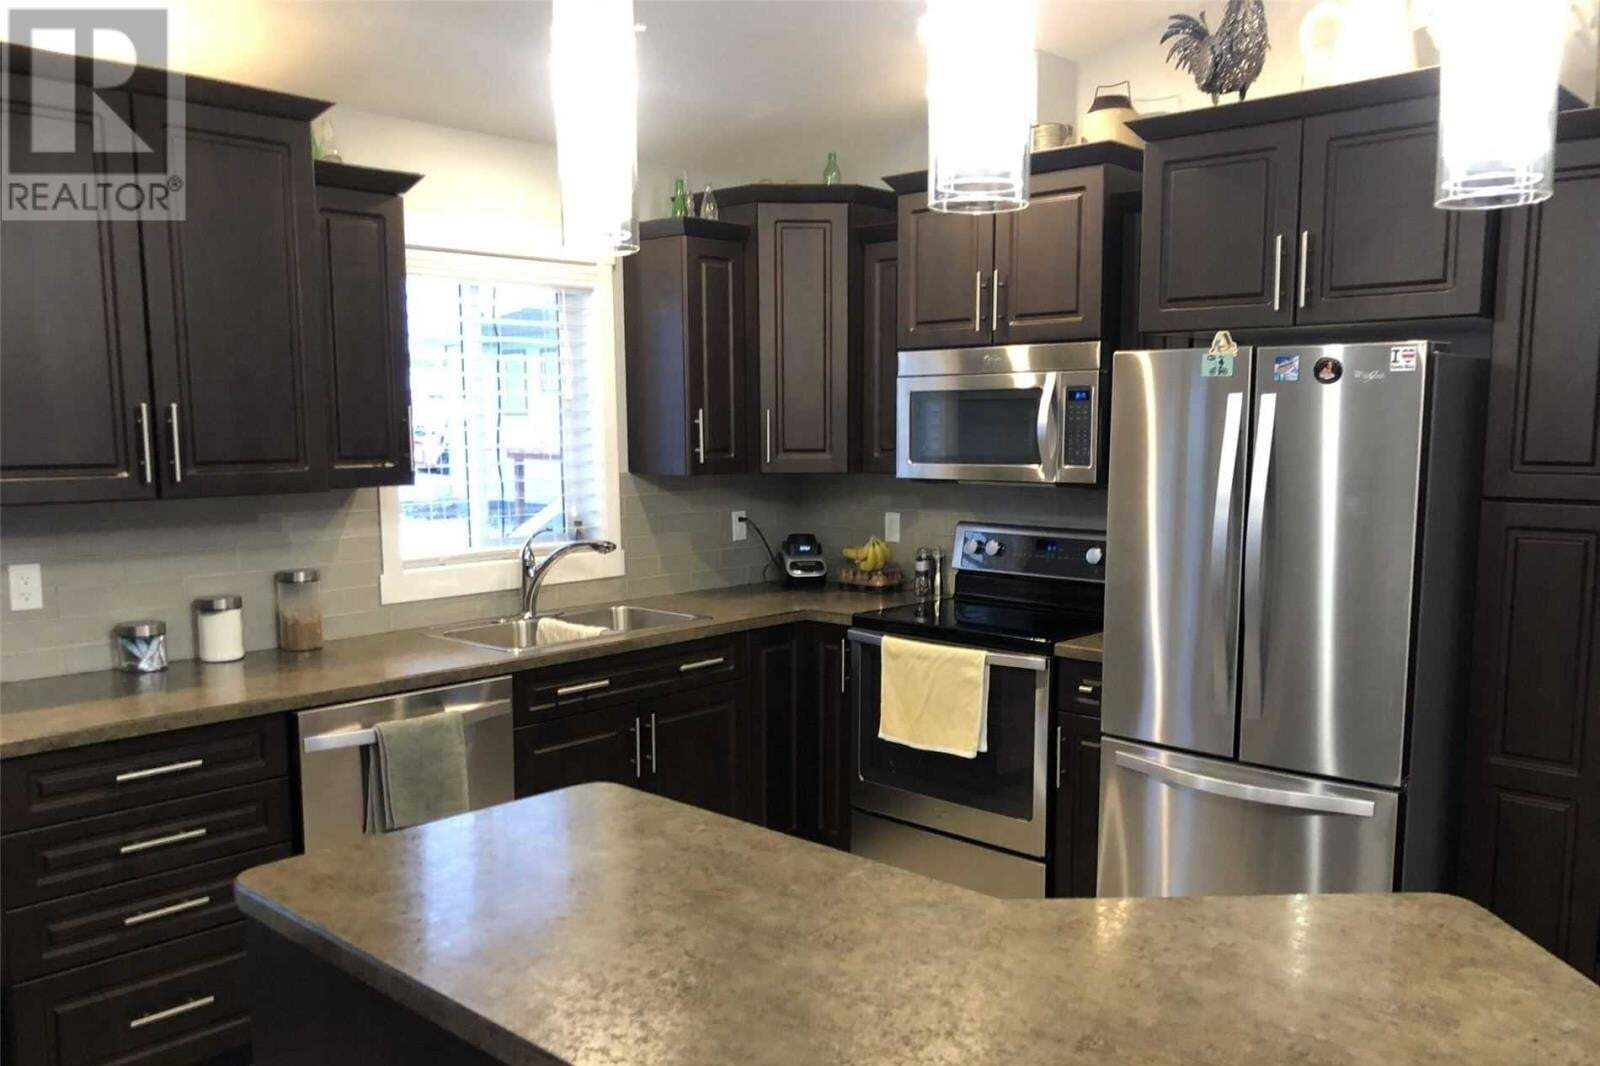 House for sale at 1000 88  Dawson Creek British Columbia - MLS: X4832947